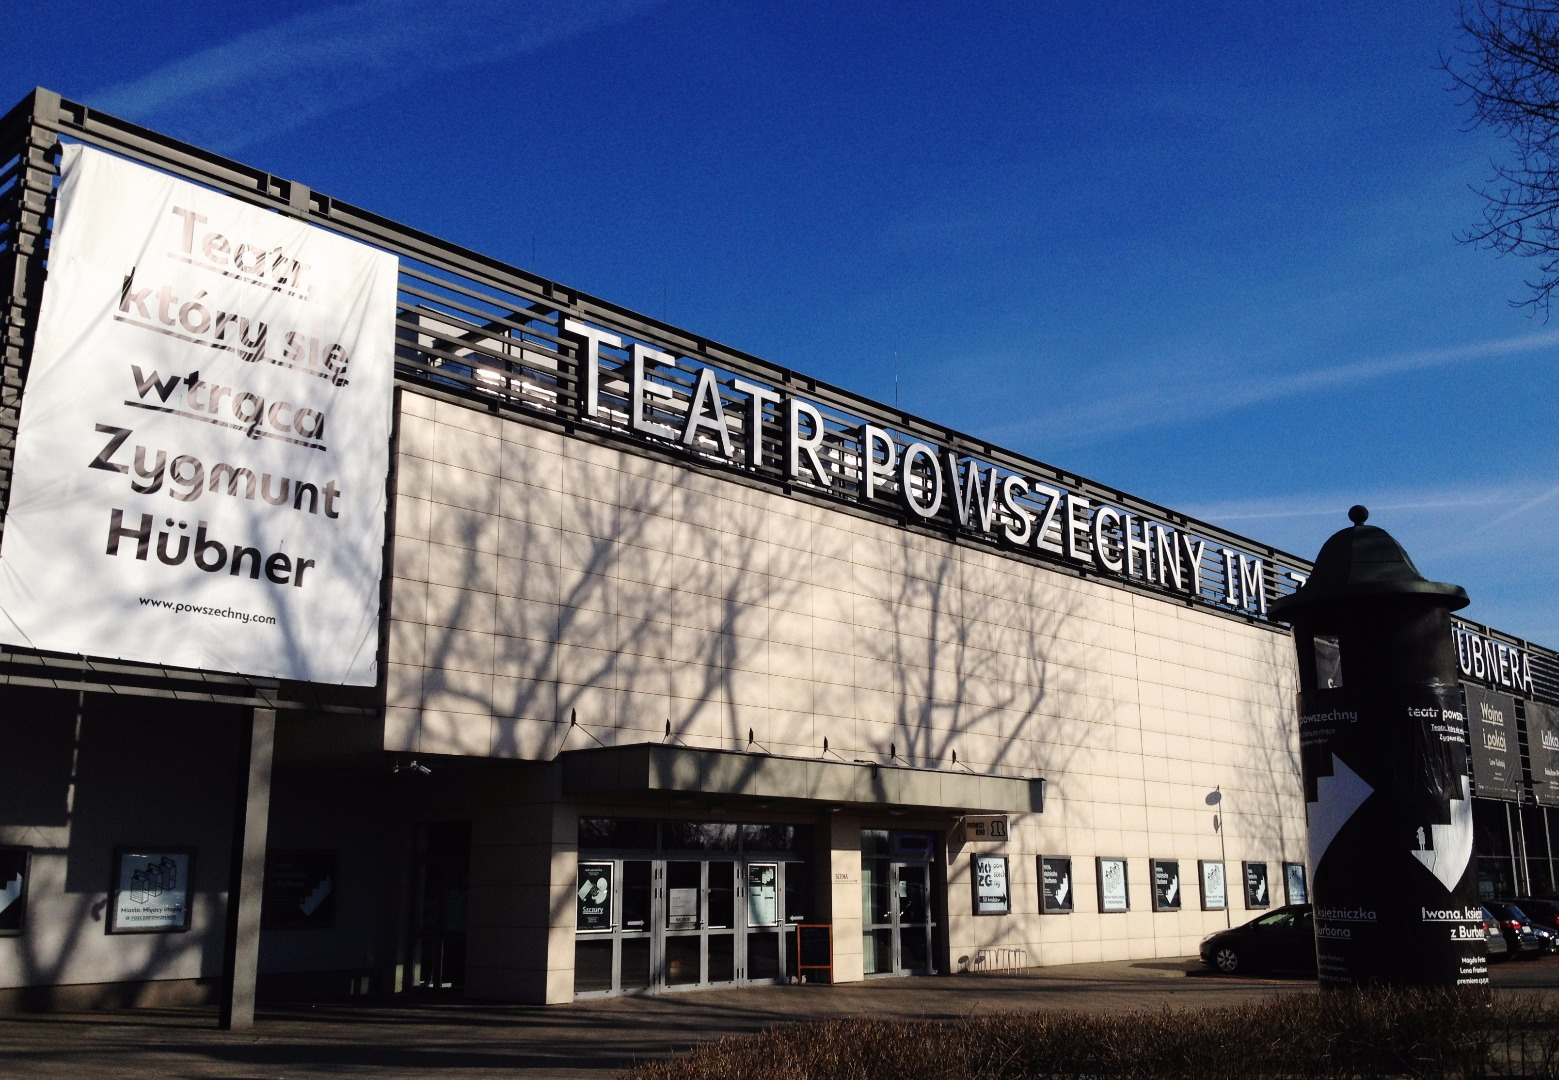 Powszechny Theatre